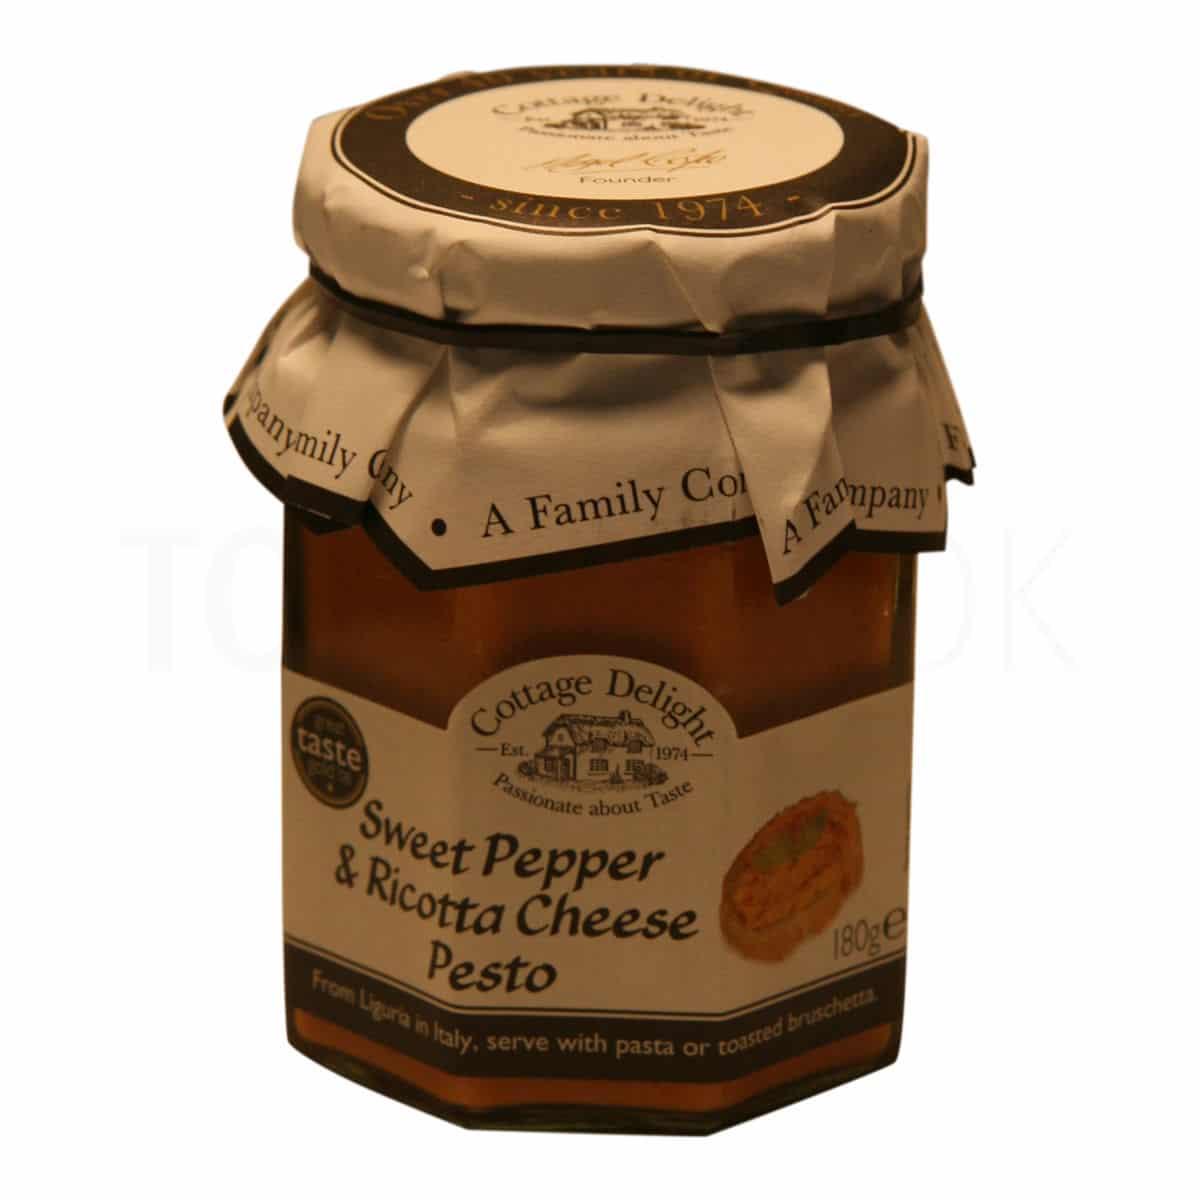 Topvine sweet pepper and ricotta cheese pesto